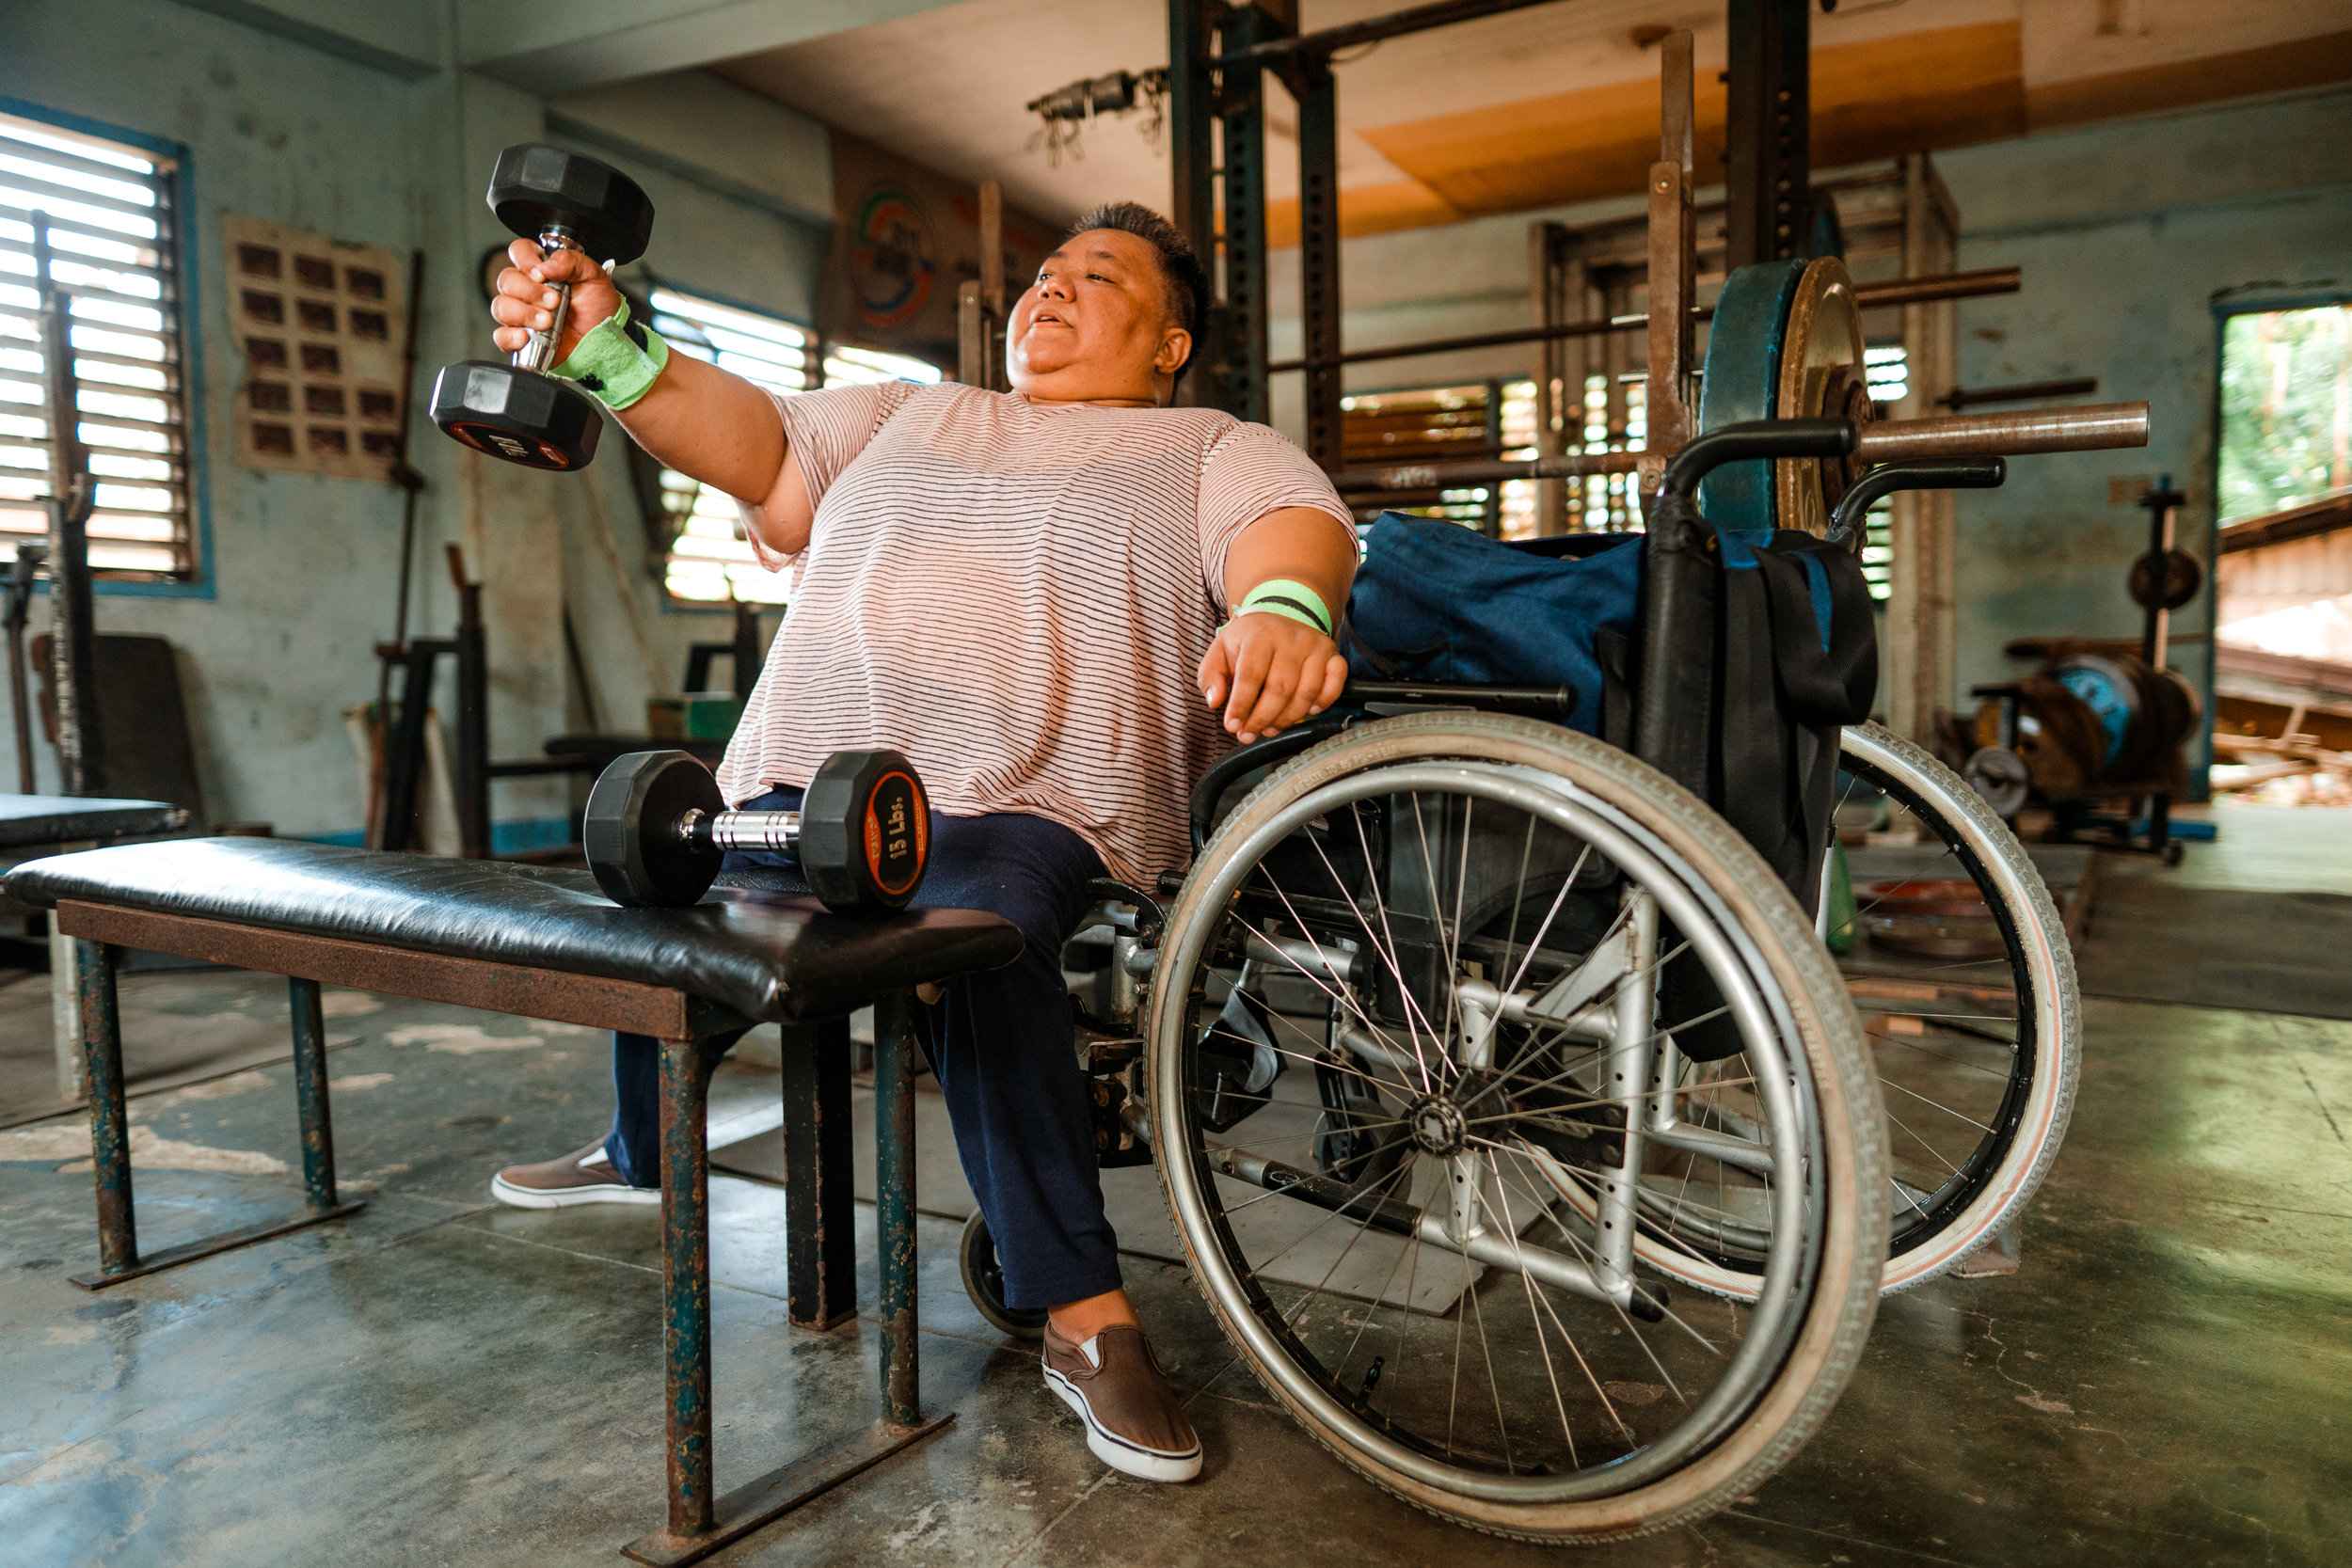 ProjectDjuna_MANILA_PHILIPPINES_AdelineDumapong-732976.jpg